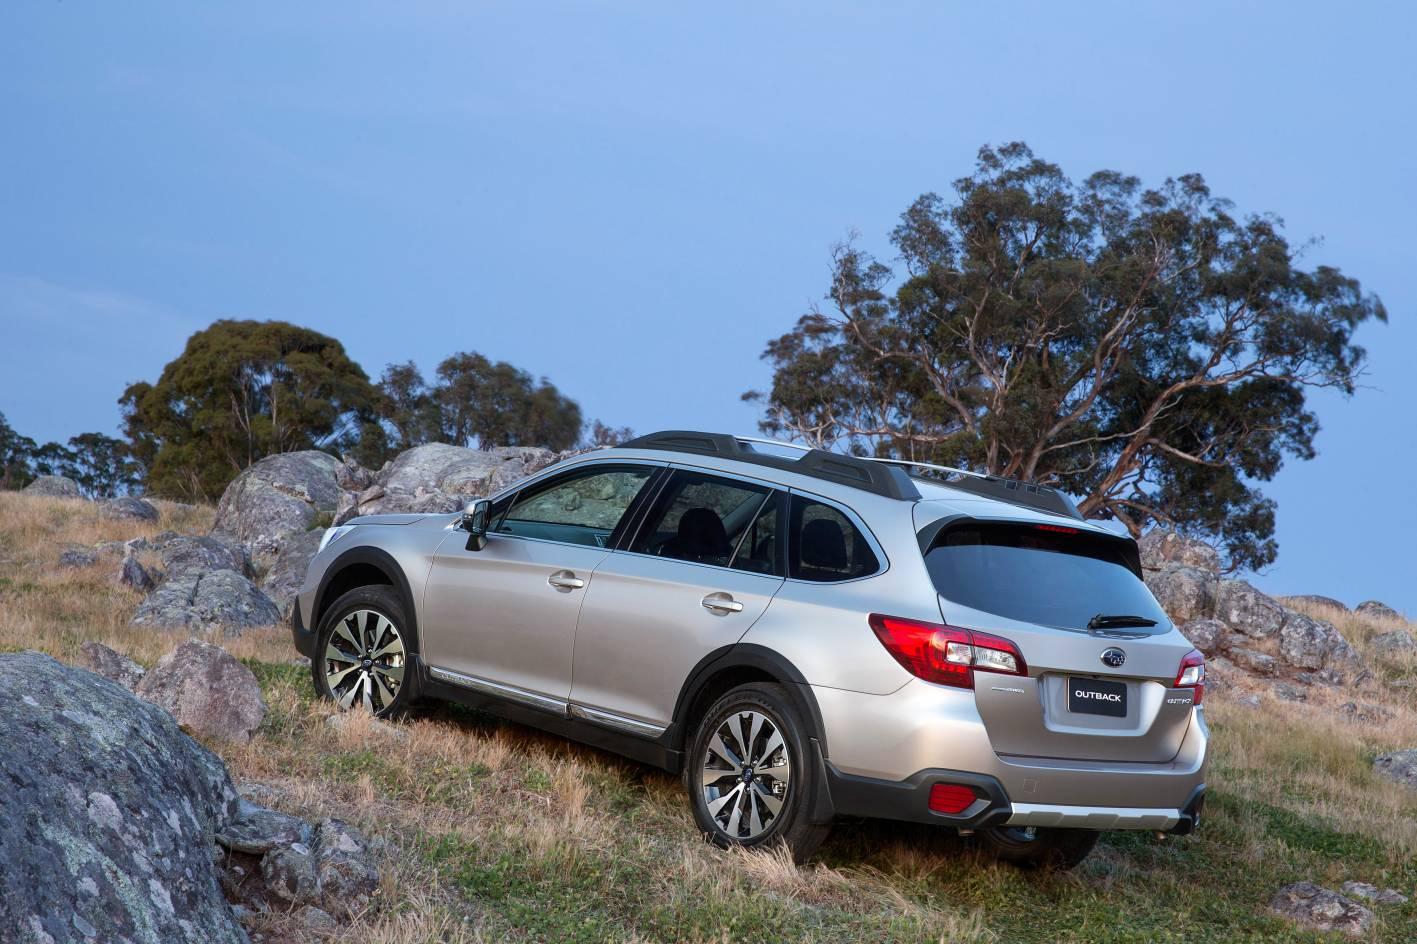 Subaru Cars - News: 2015 Subaru Outback on sale from $35,990